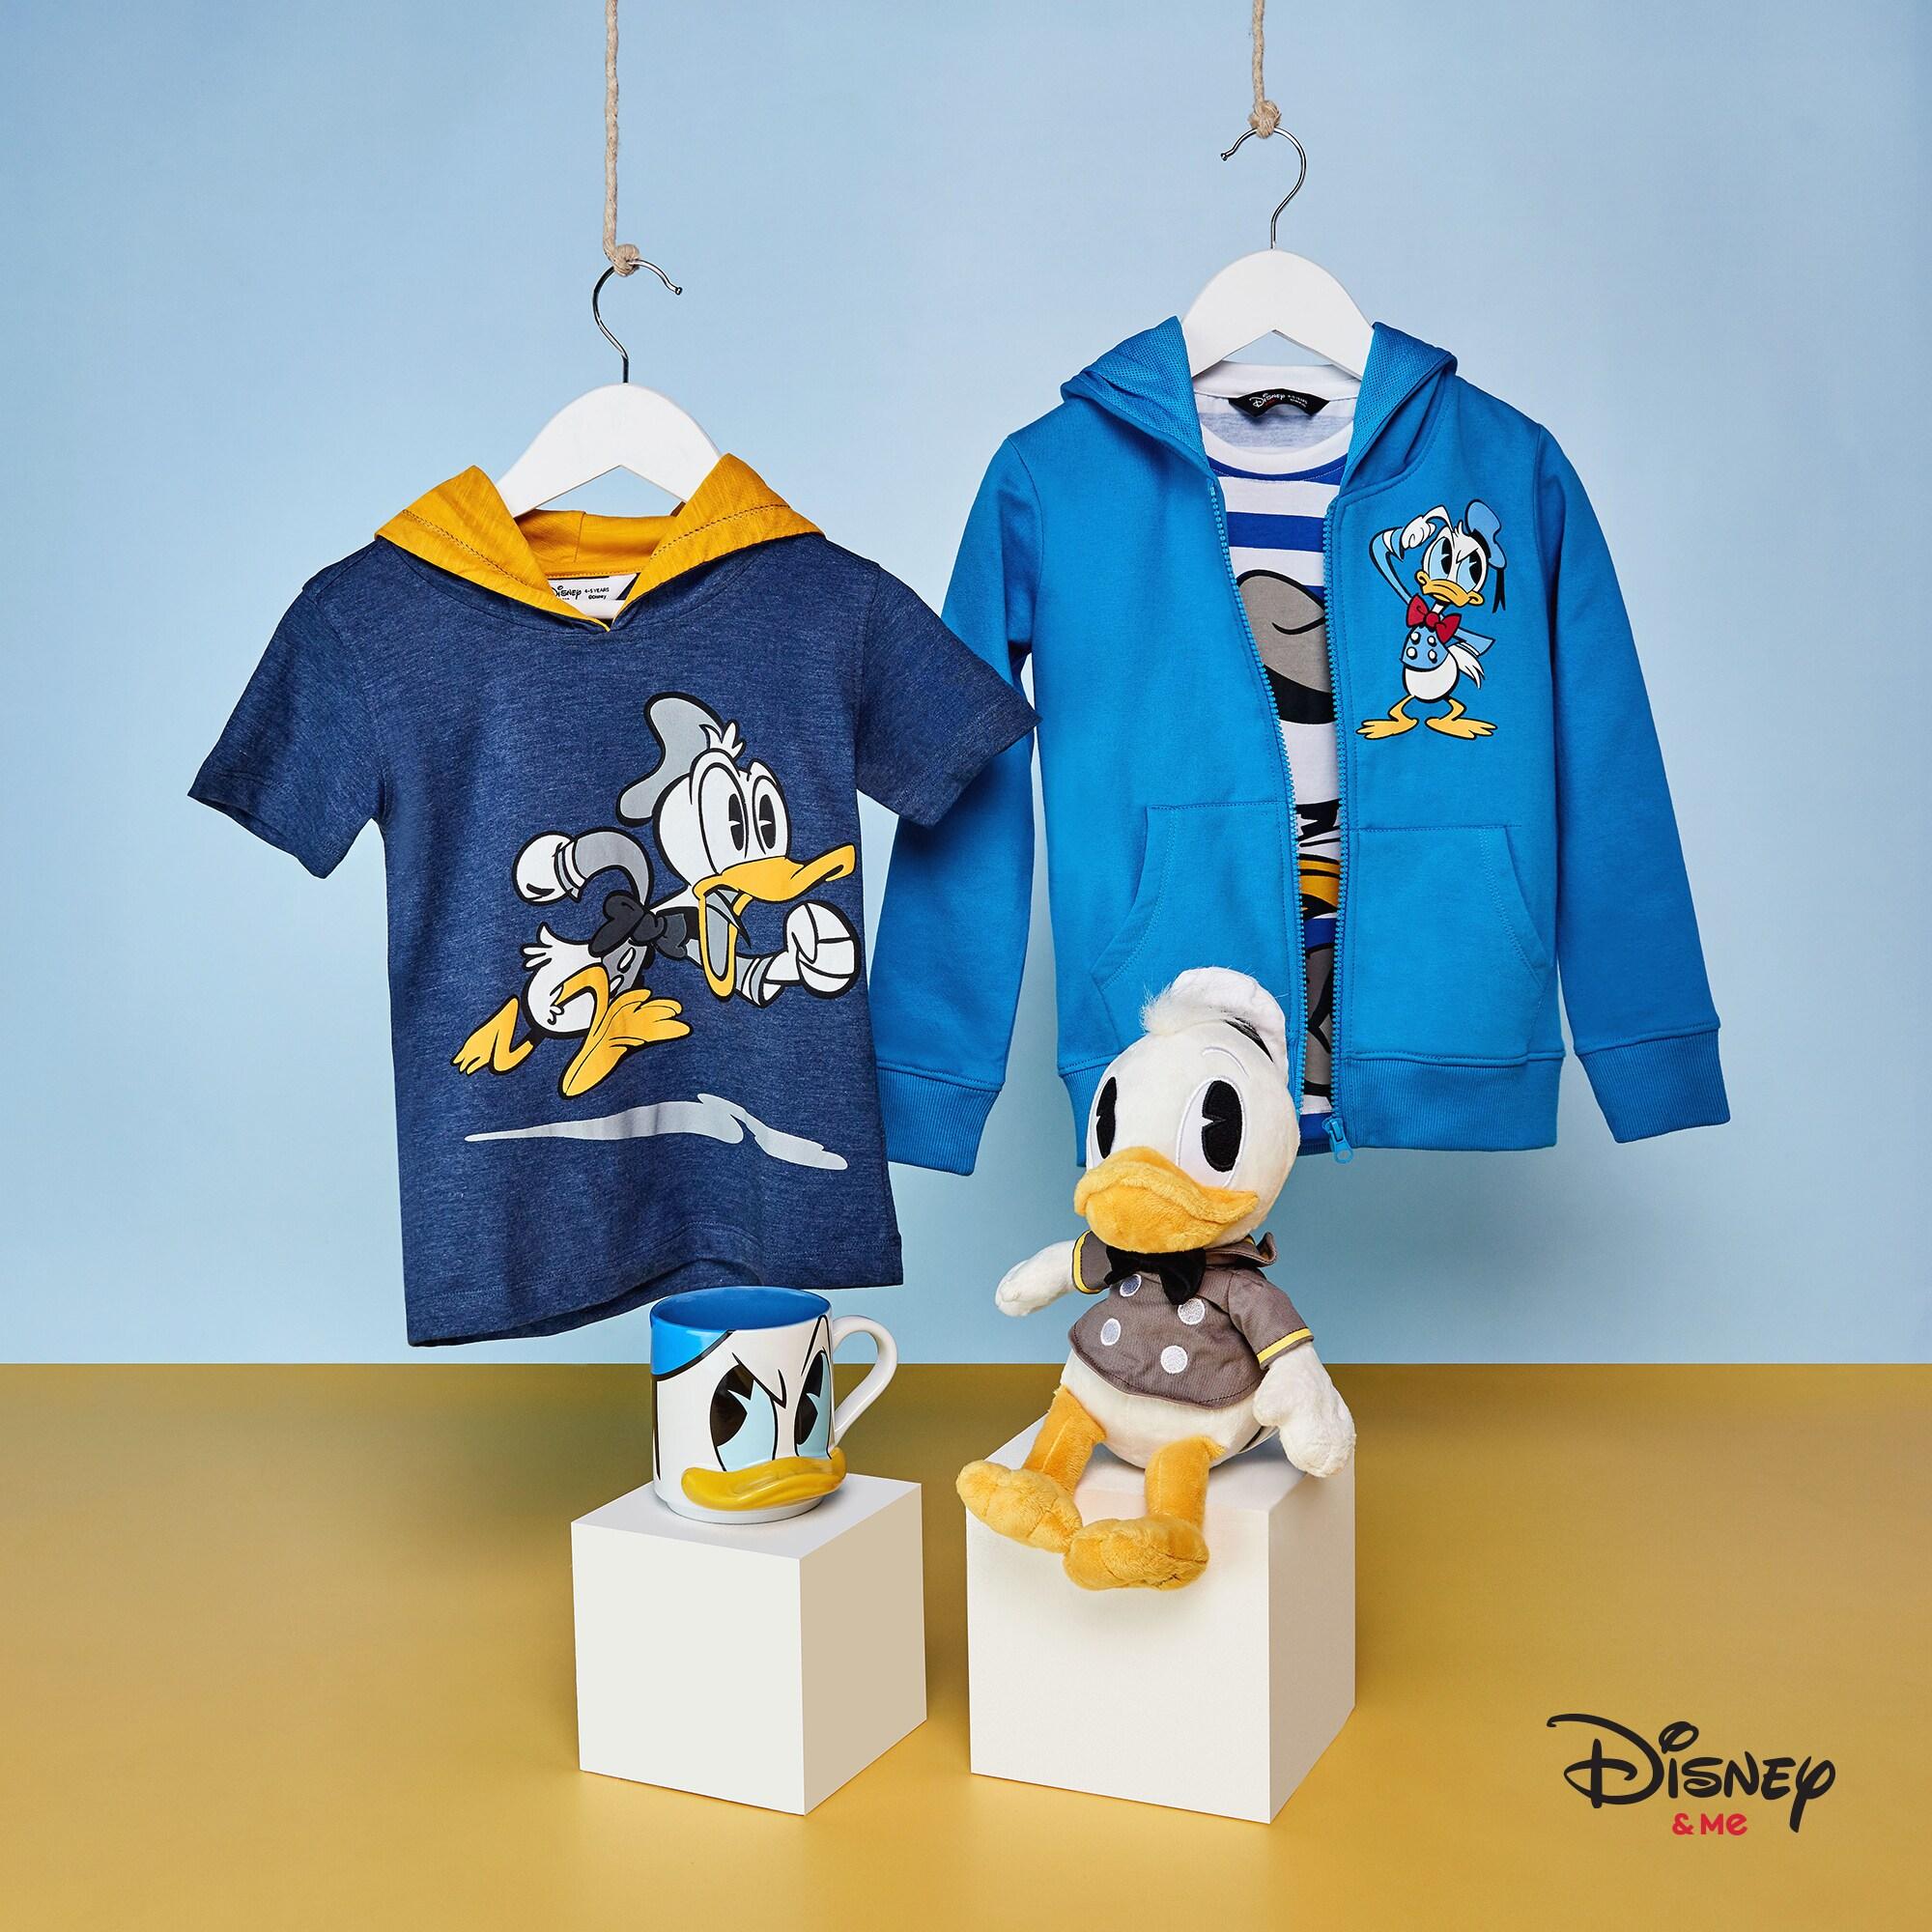 Disney & Me Donald | Disney & Me Page